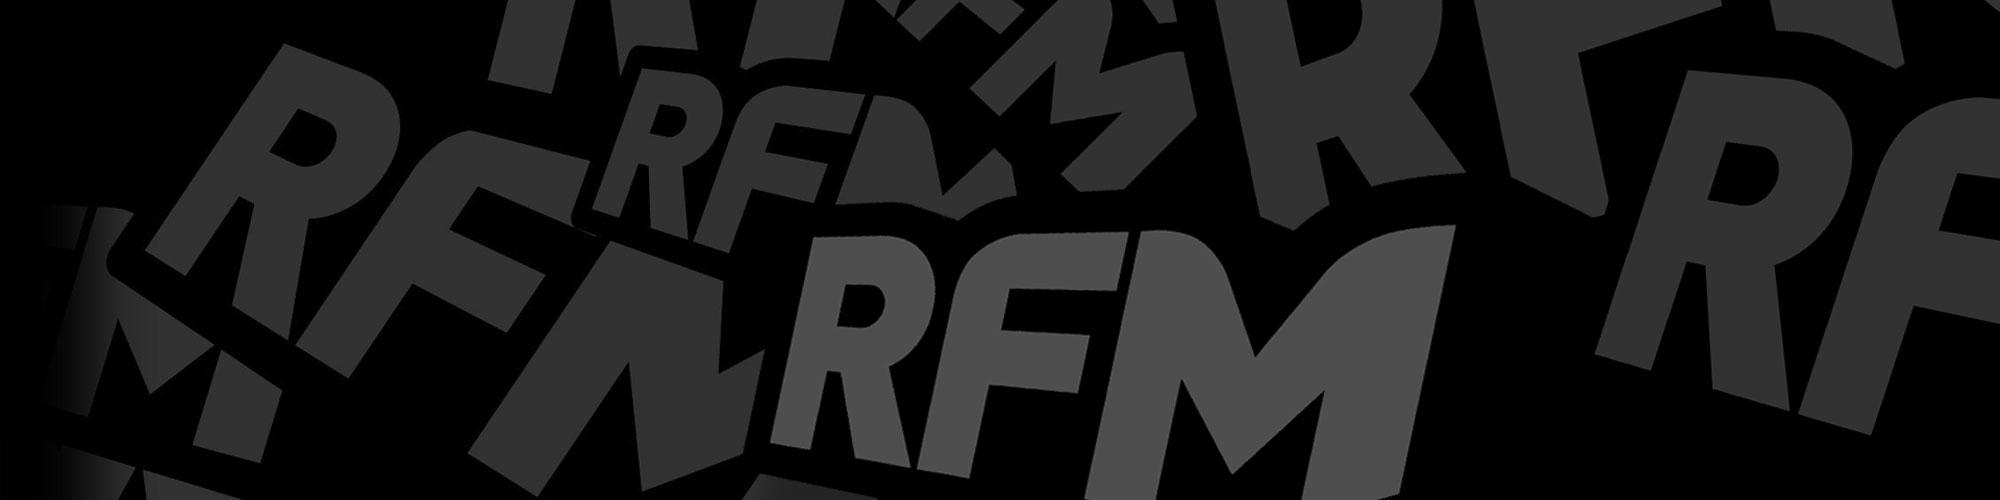 Tu és RFM - Inscreve-te